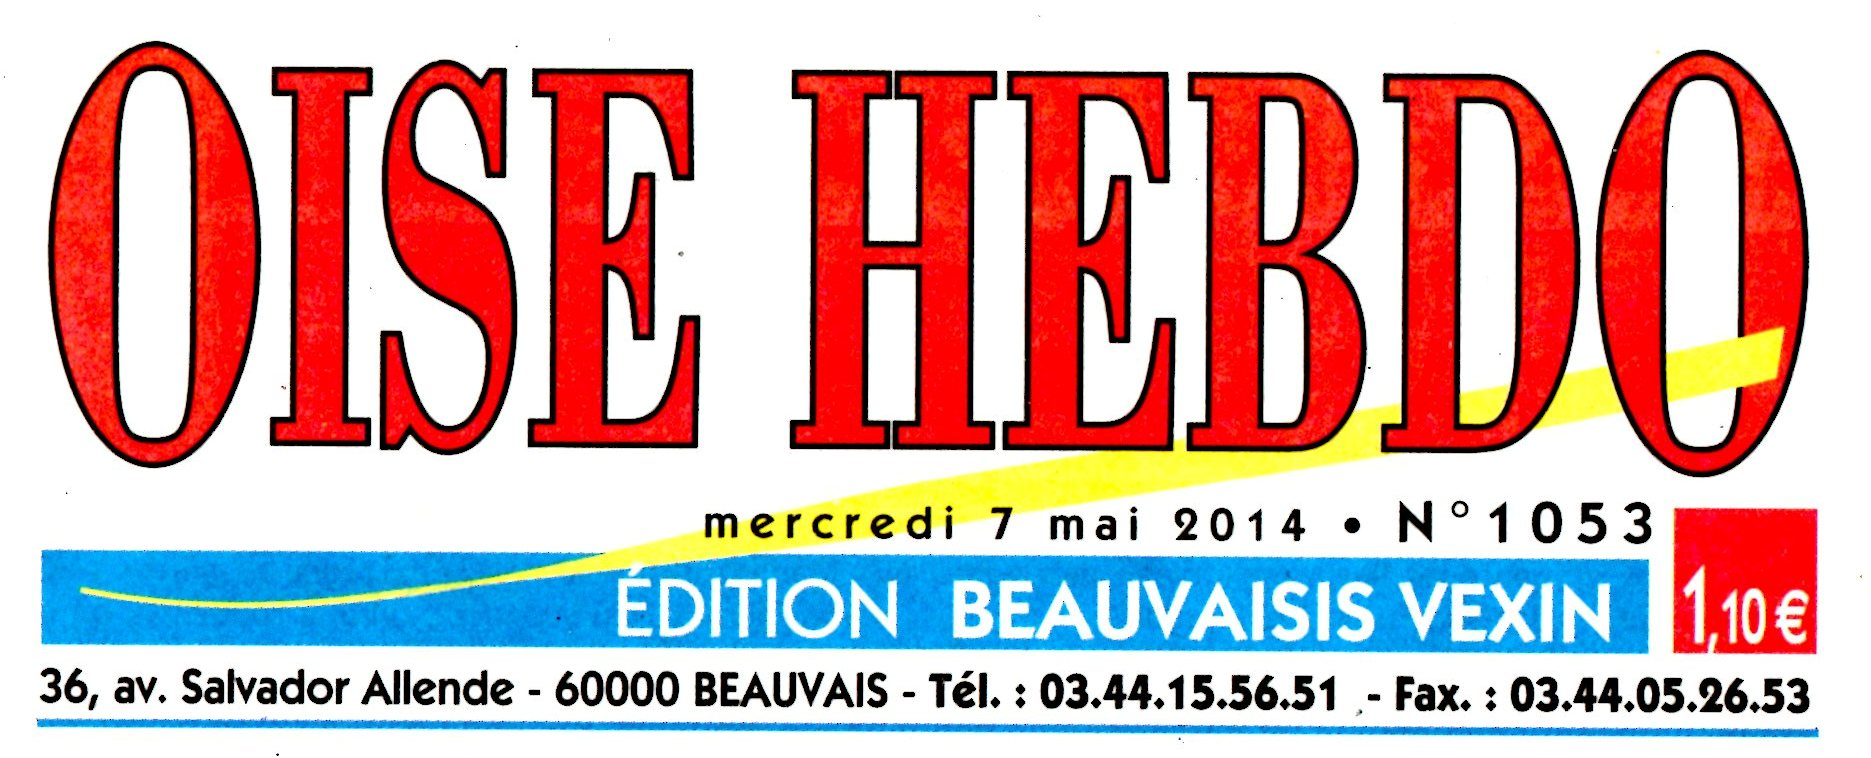 L'OISE HEBDO BETTY 7 MAI 2014001